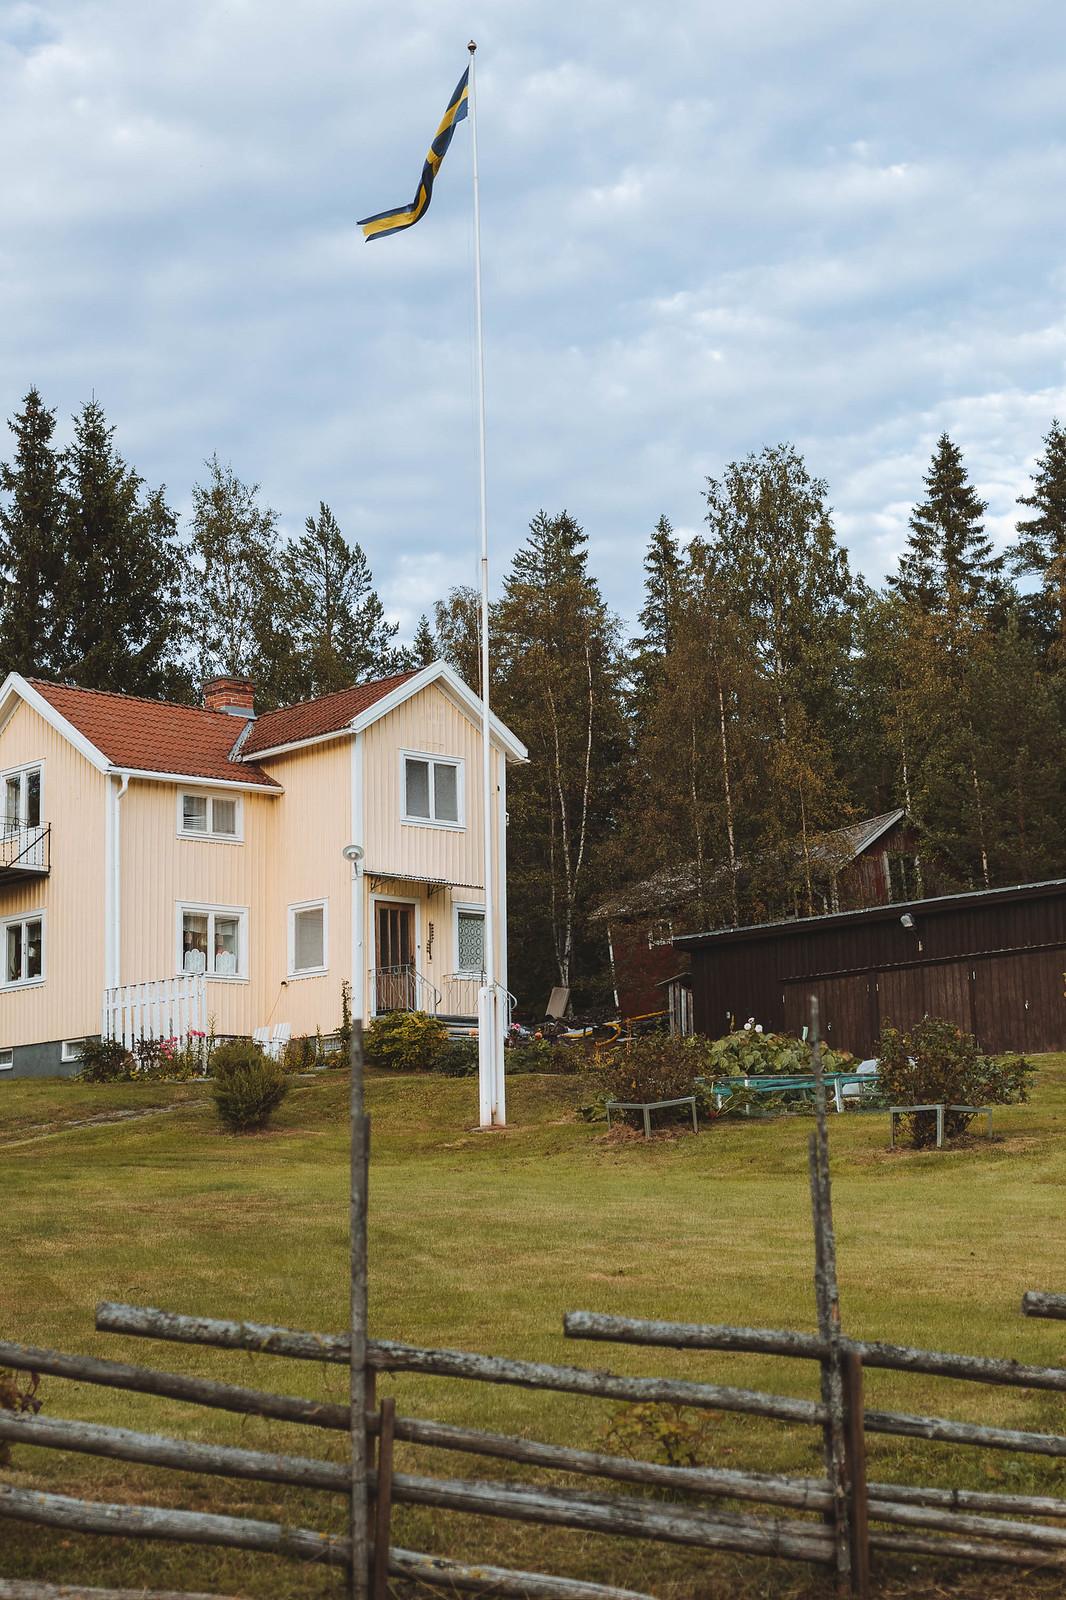 20190831 - Surströmming i Kvaved